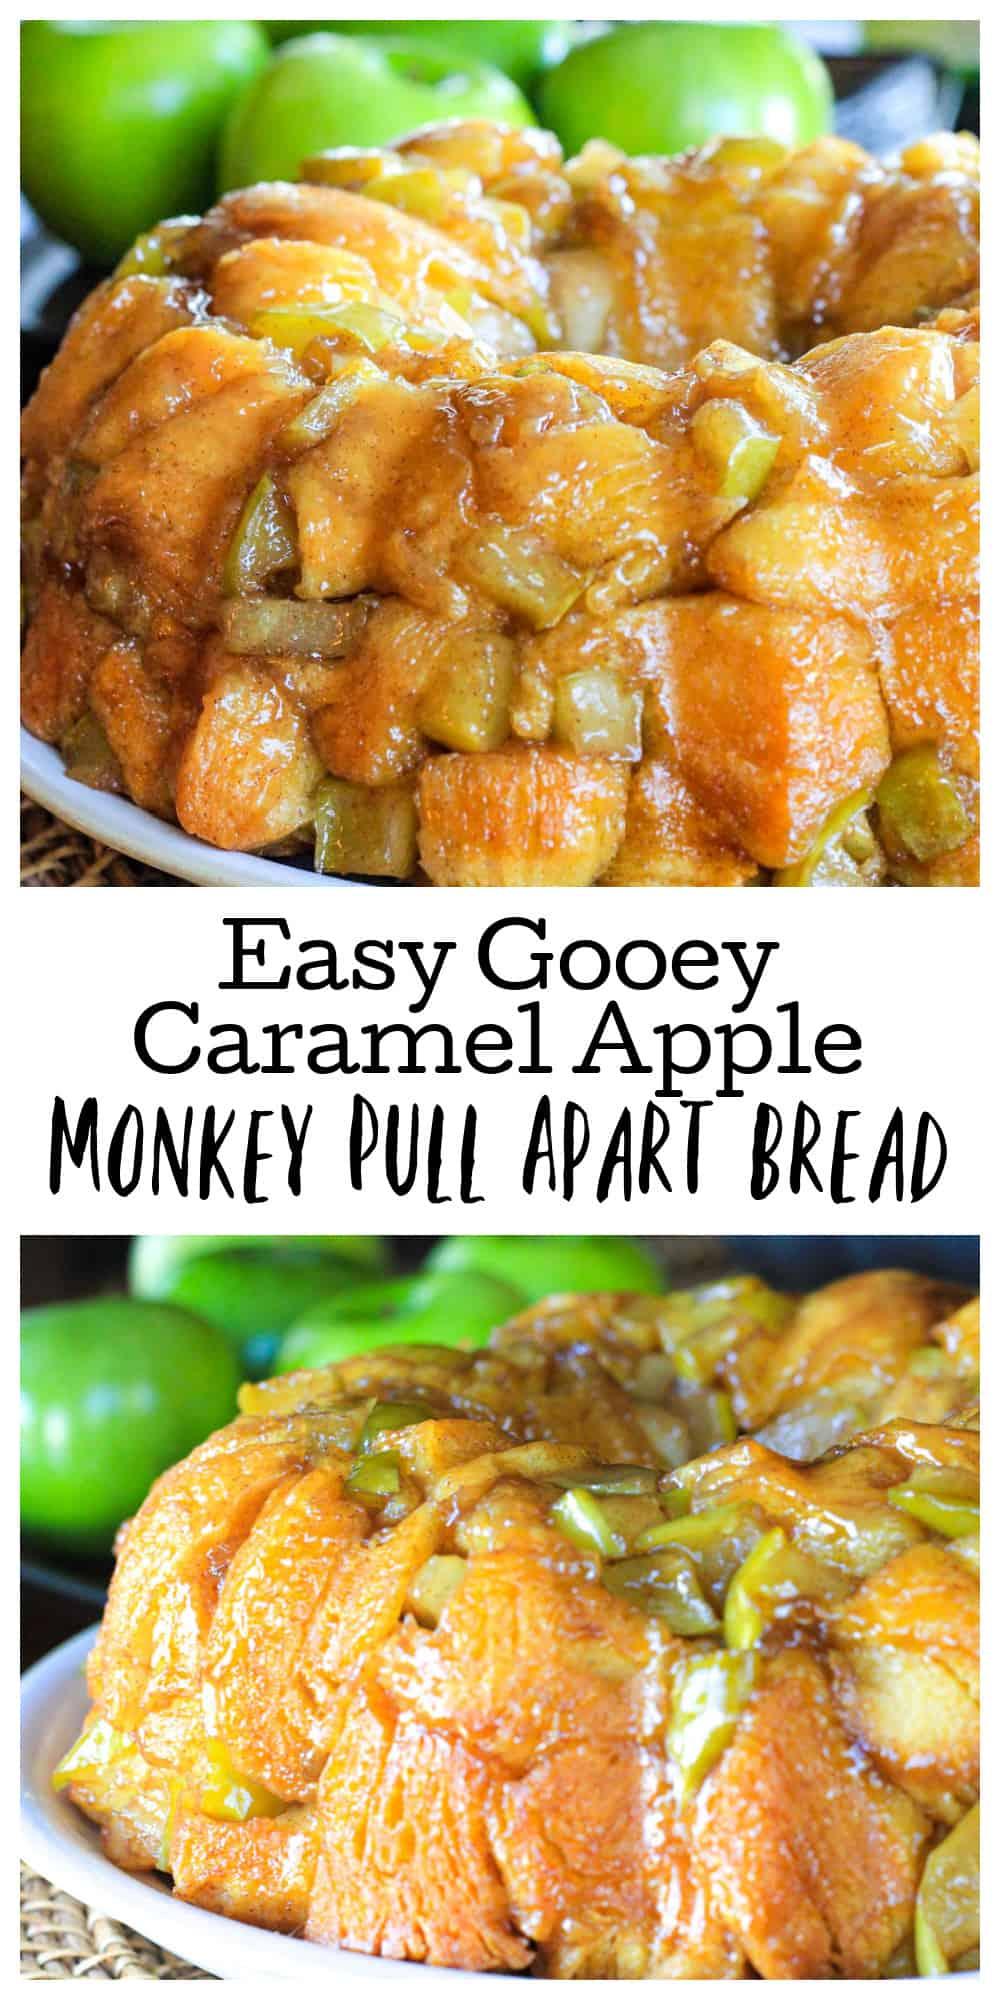 Easy Gooey Caramel Apple Monkey Pull Apart Bread